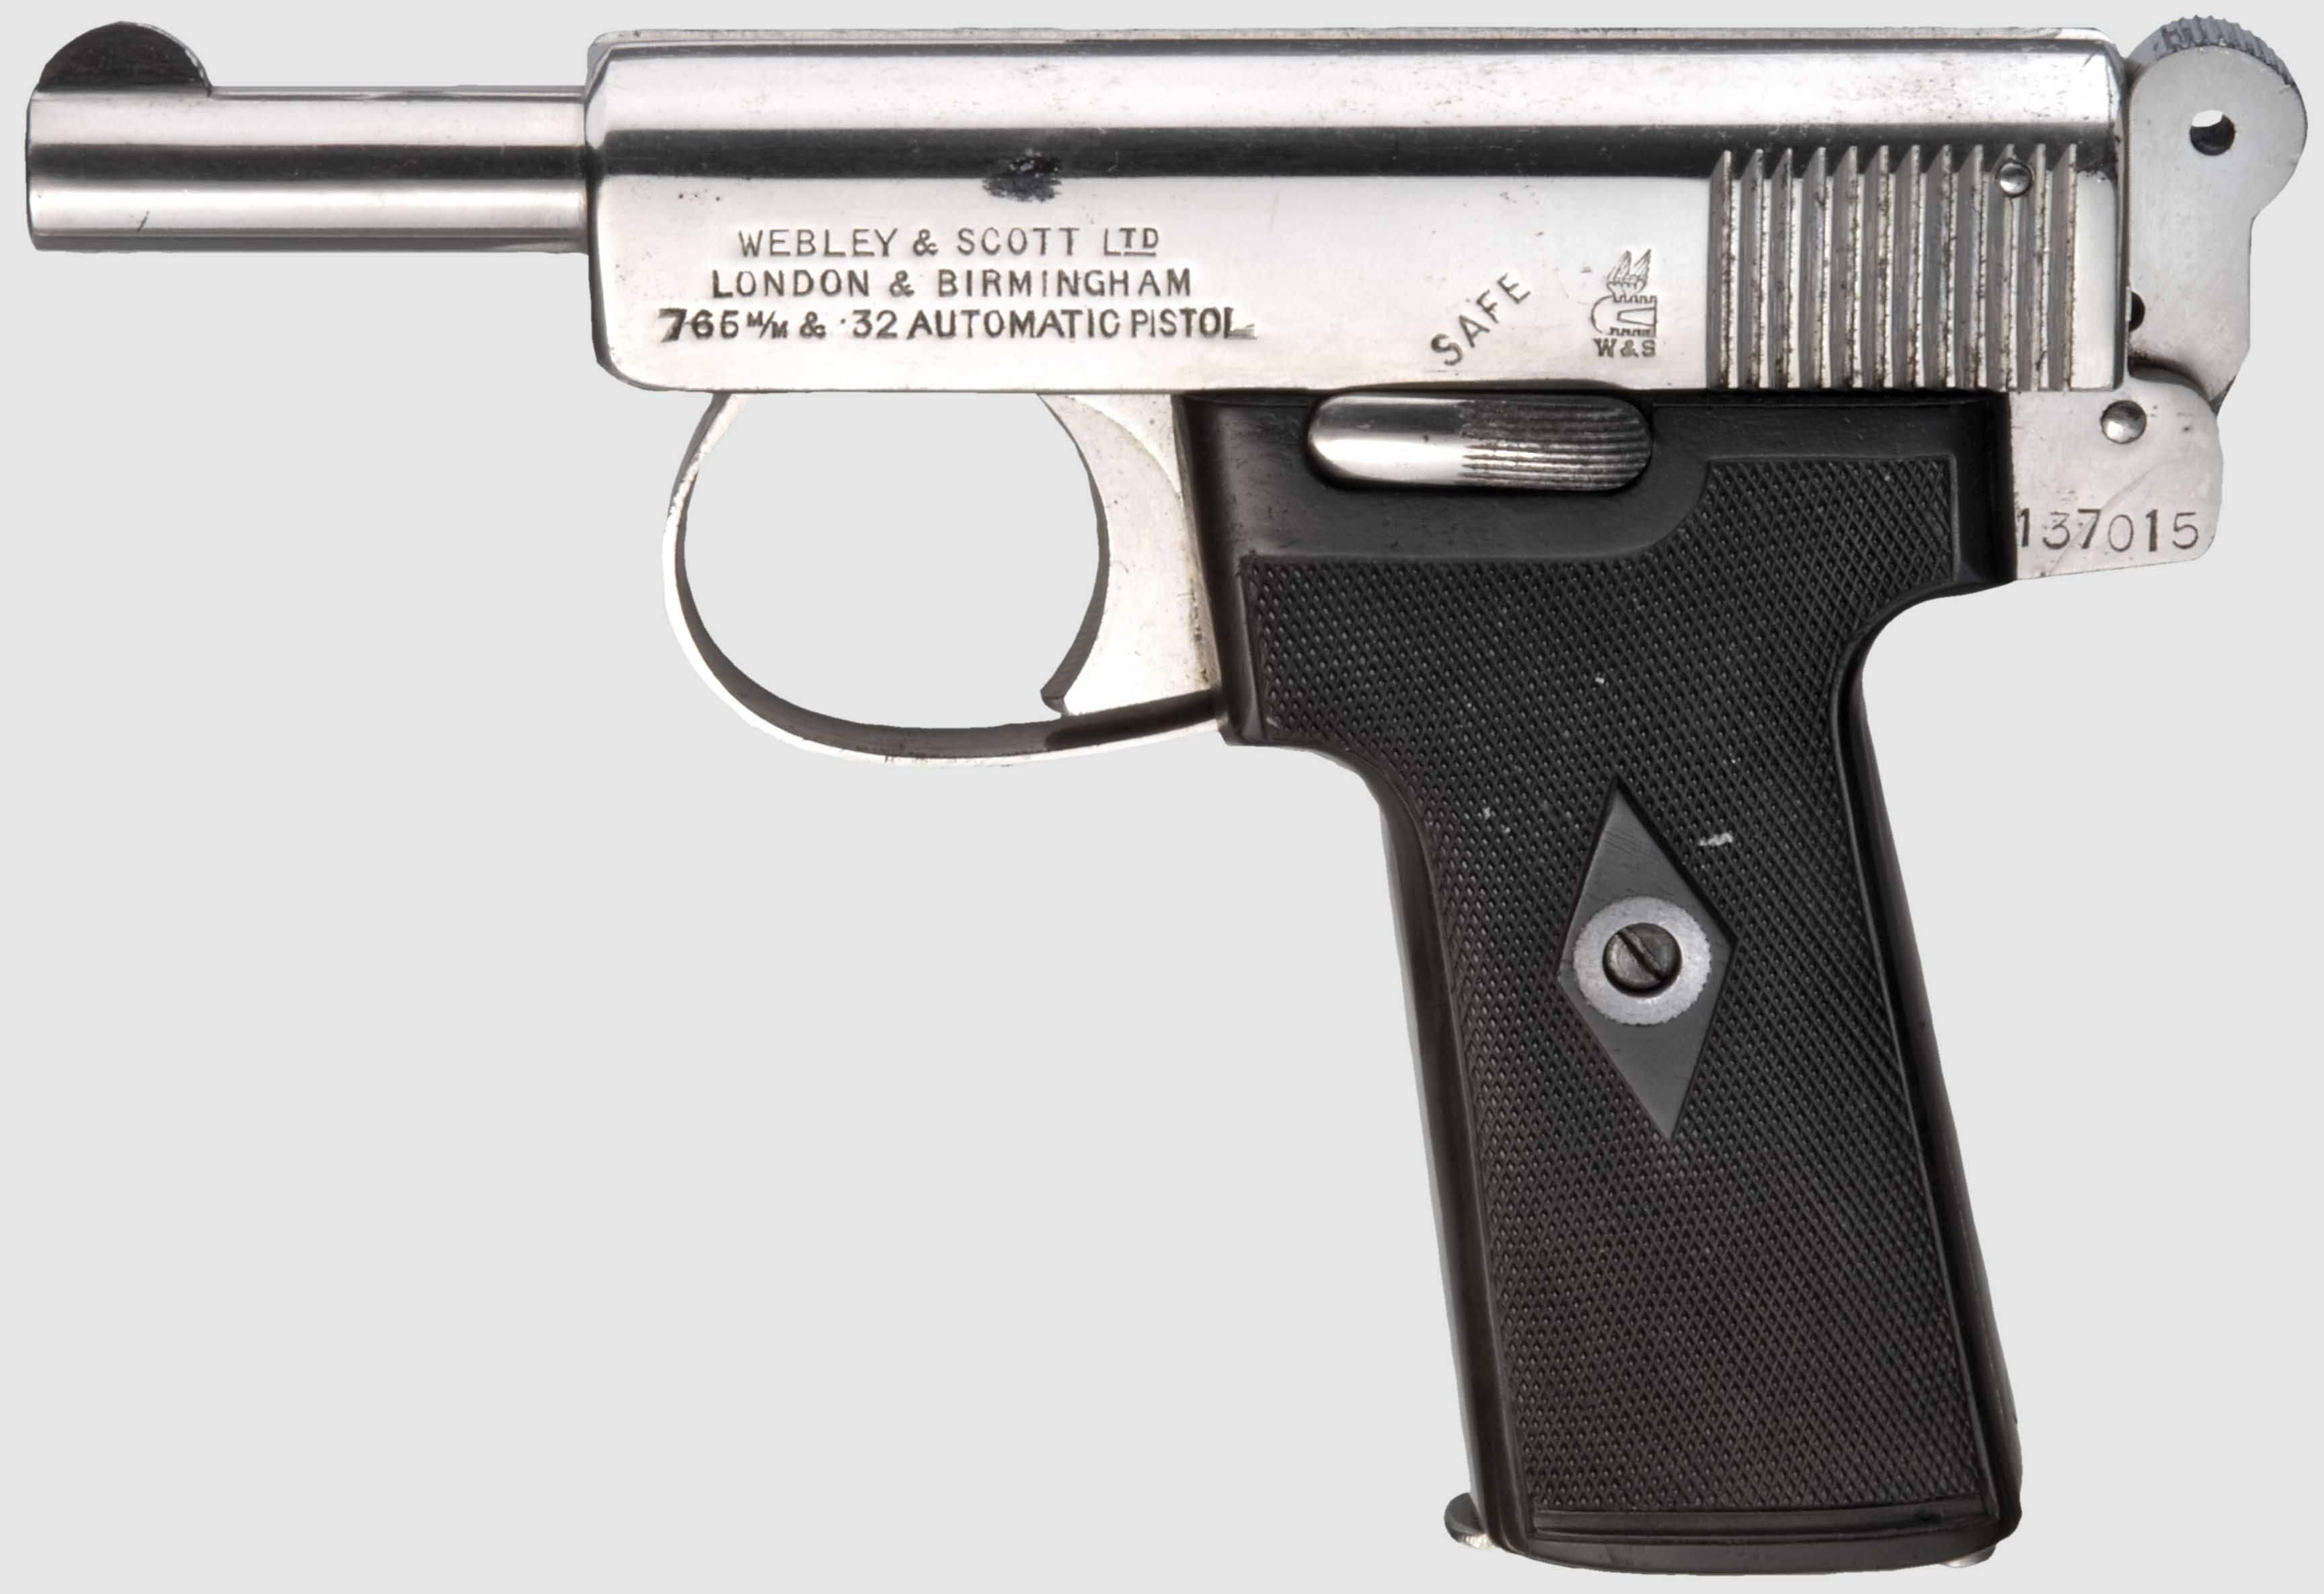 Револьвер webley - webley revolver - qwe.wiki